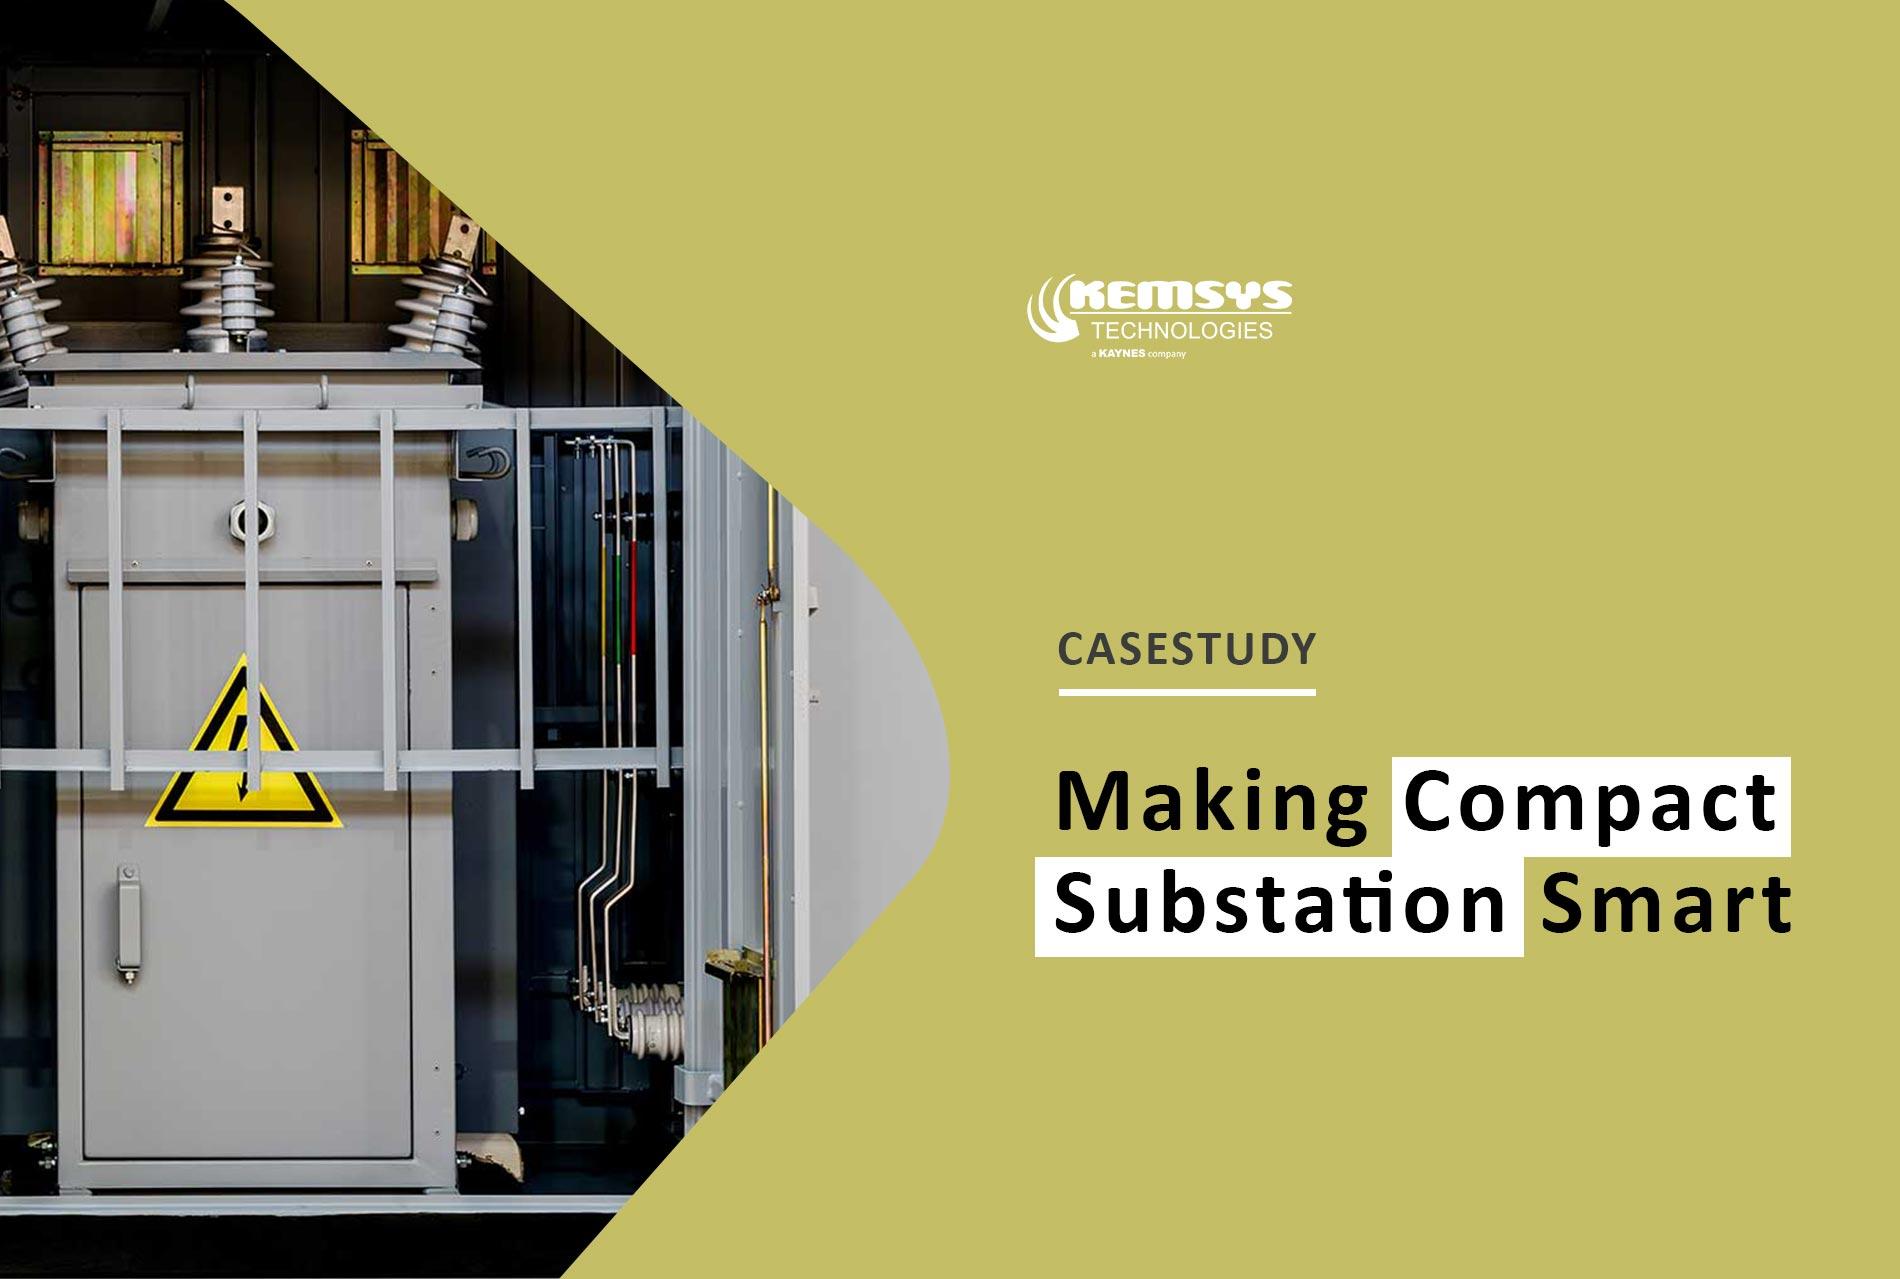 Case-Study-Making-Compact-Substation-Smart-Kemsys